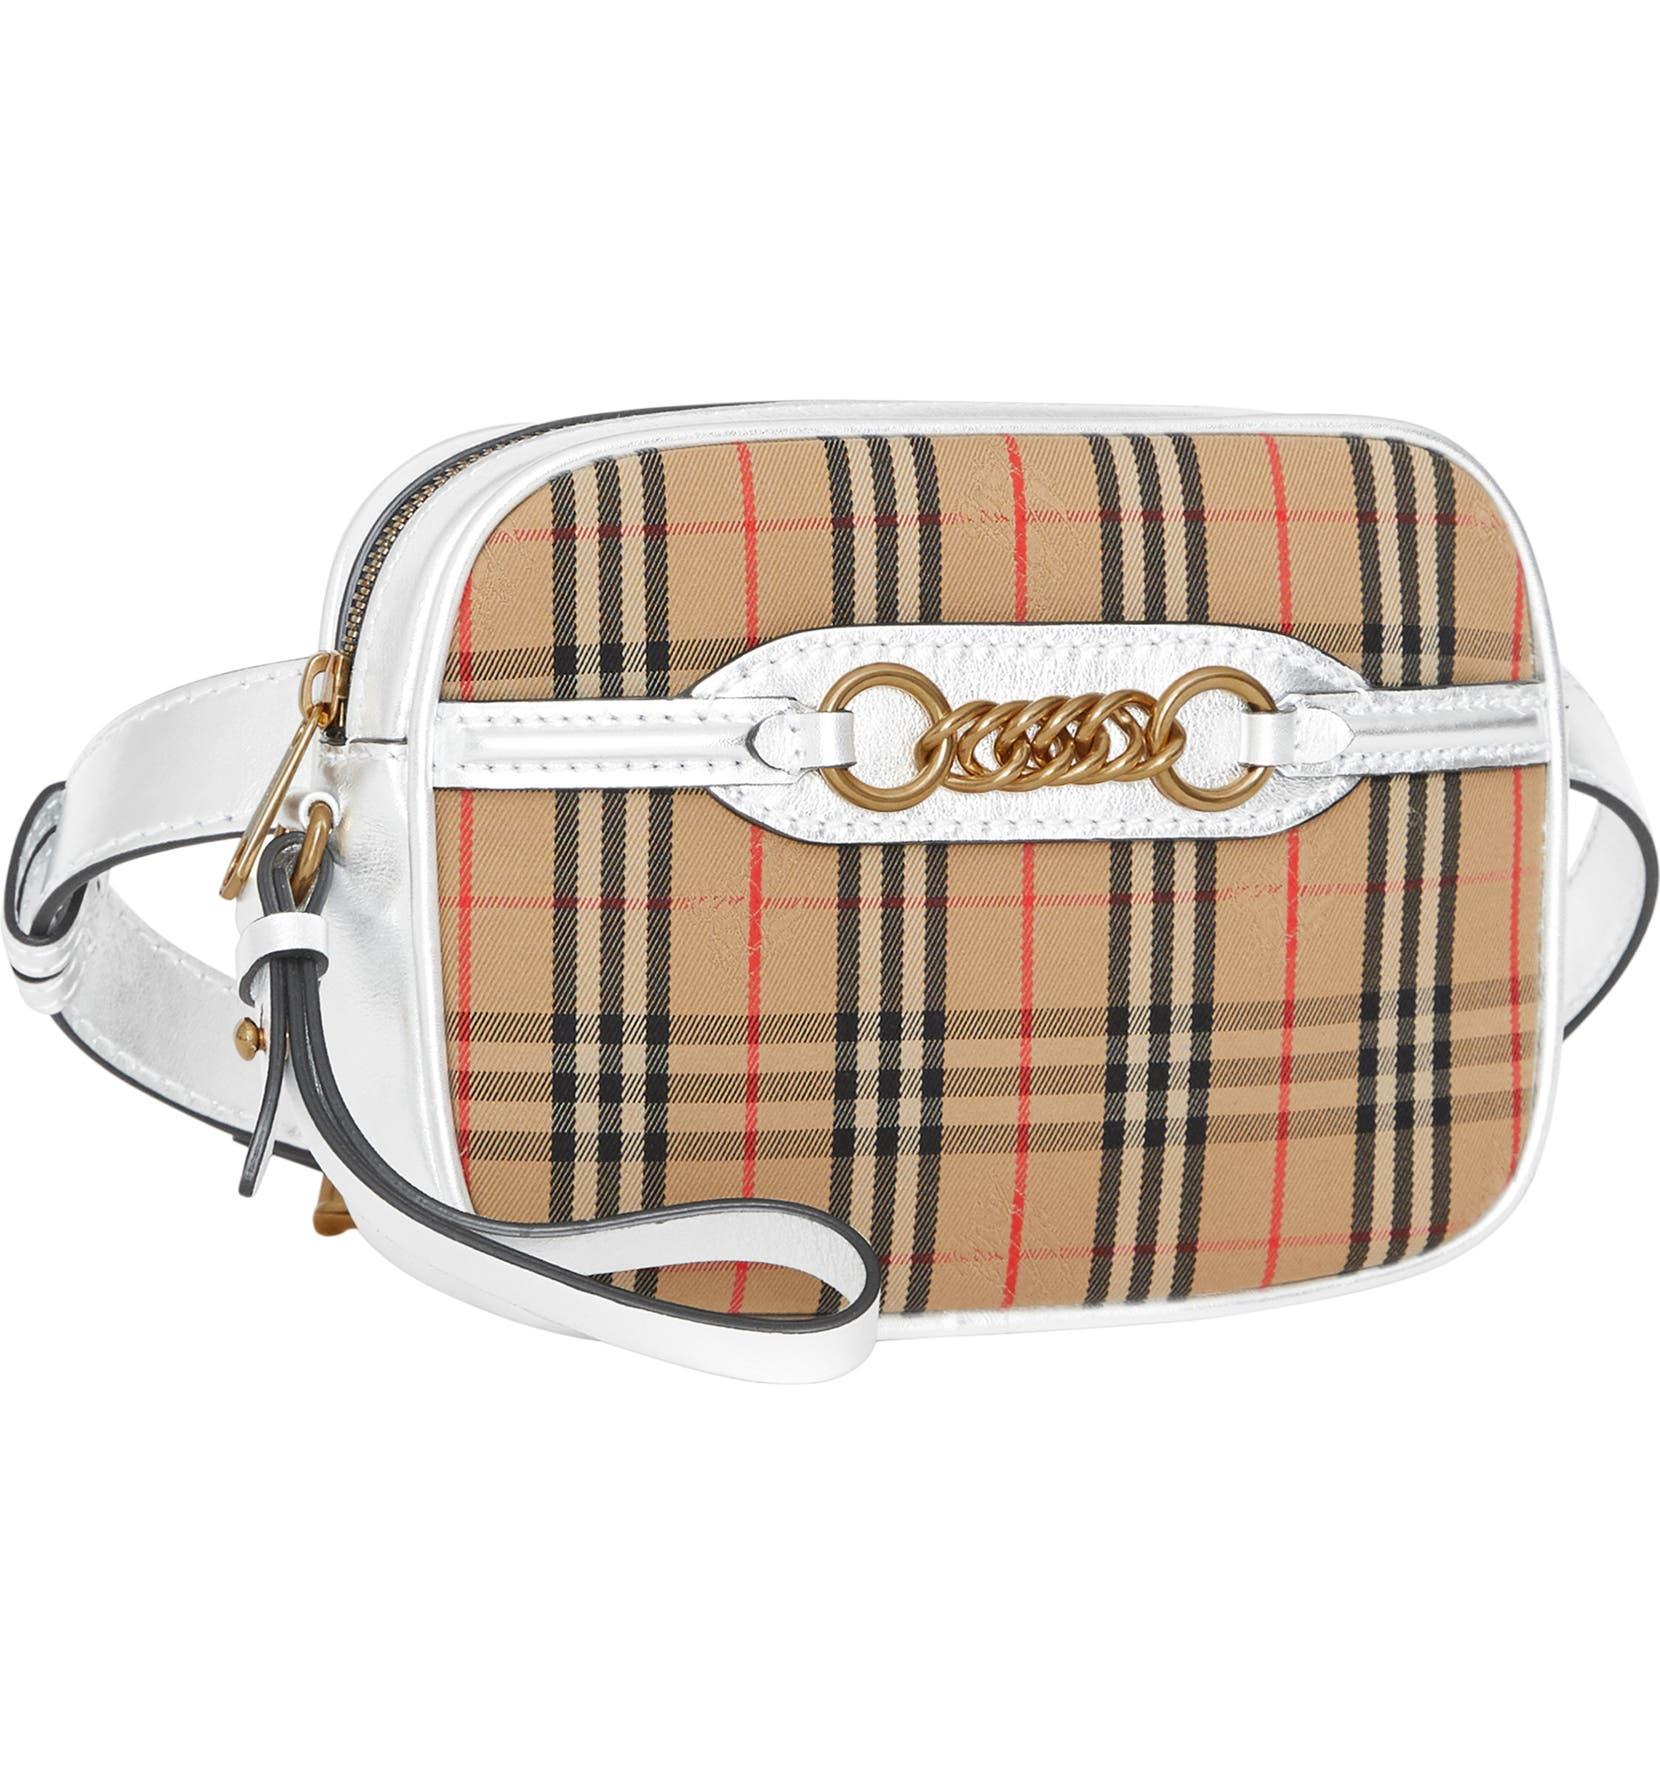 Burberry Vintage Check Link Bum Bag  352c107564028